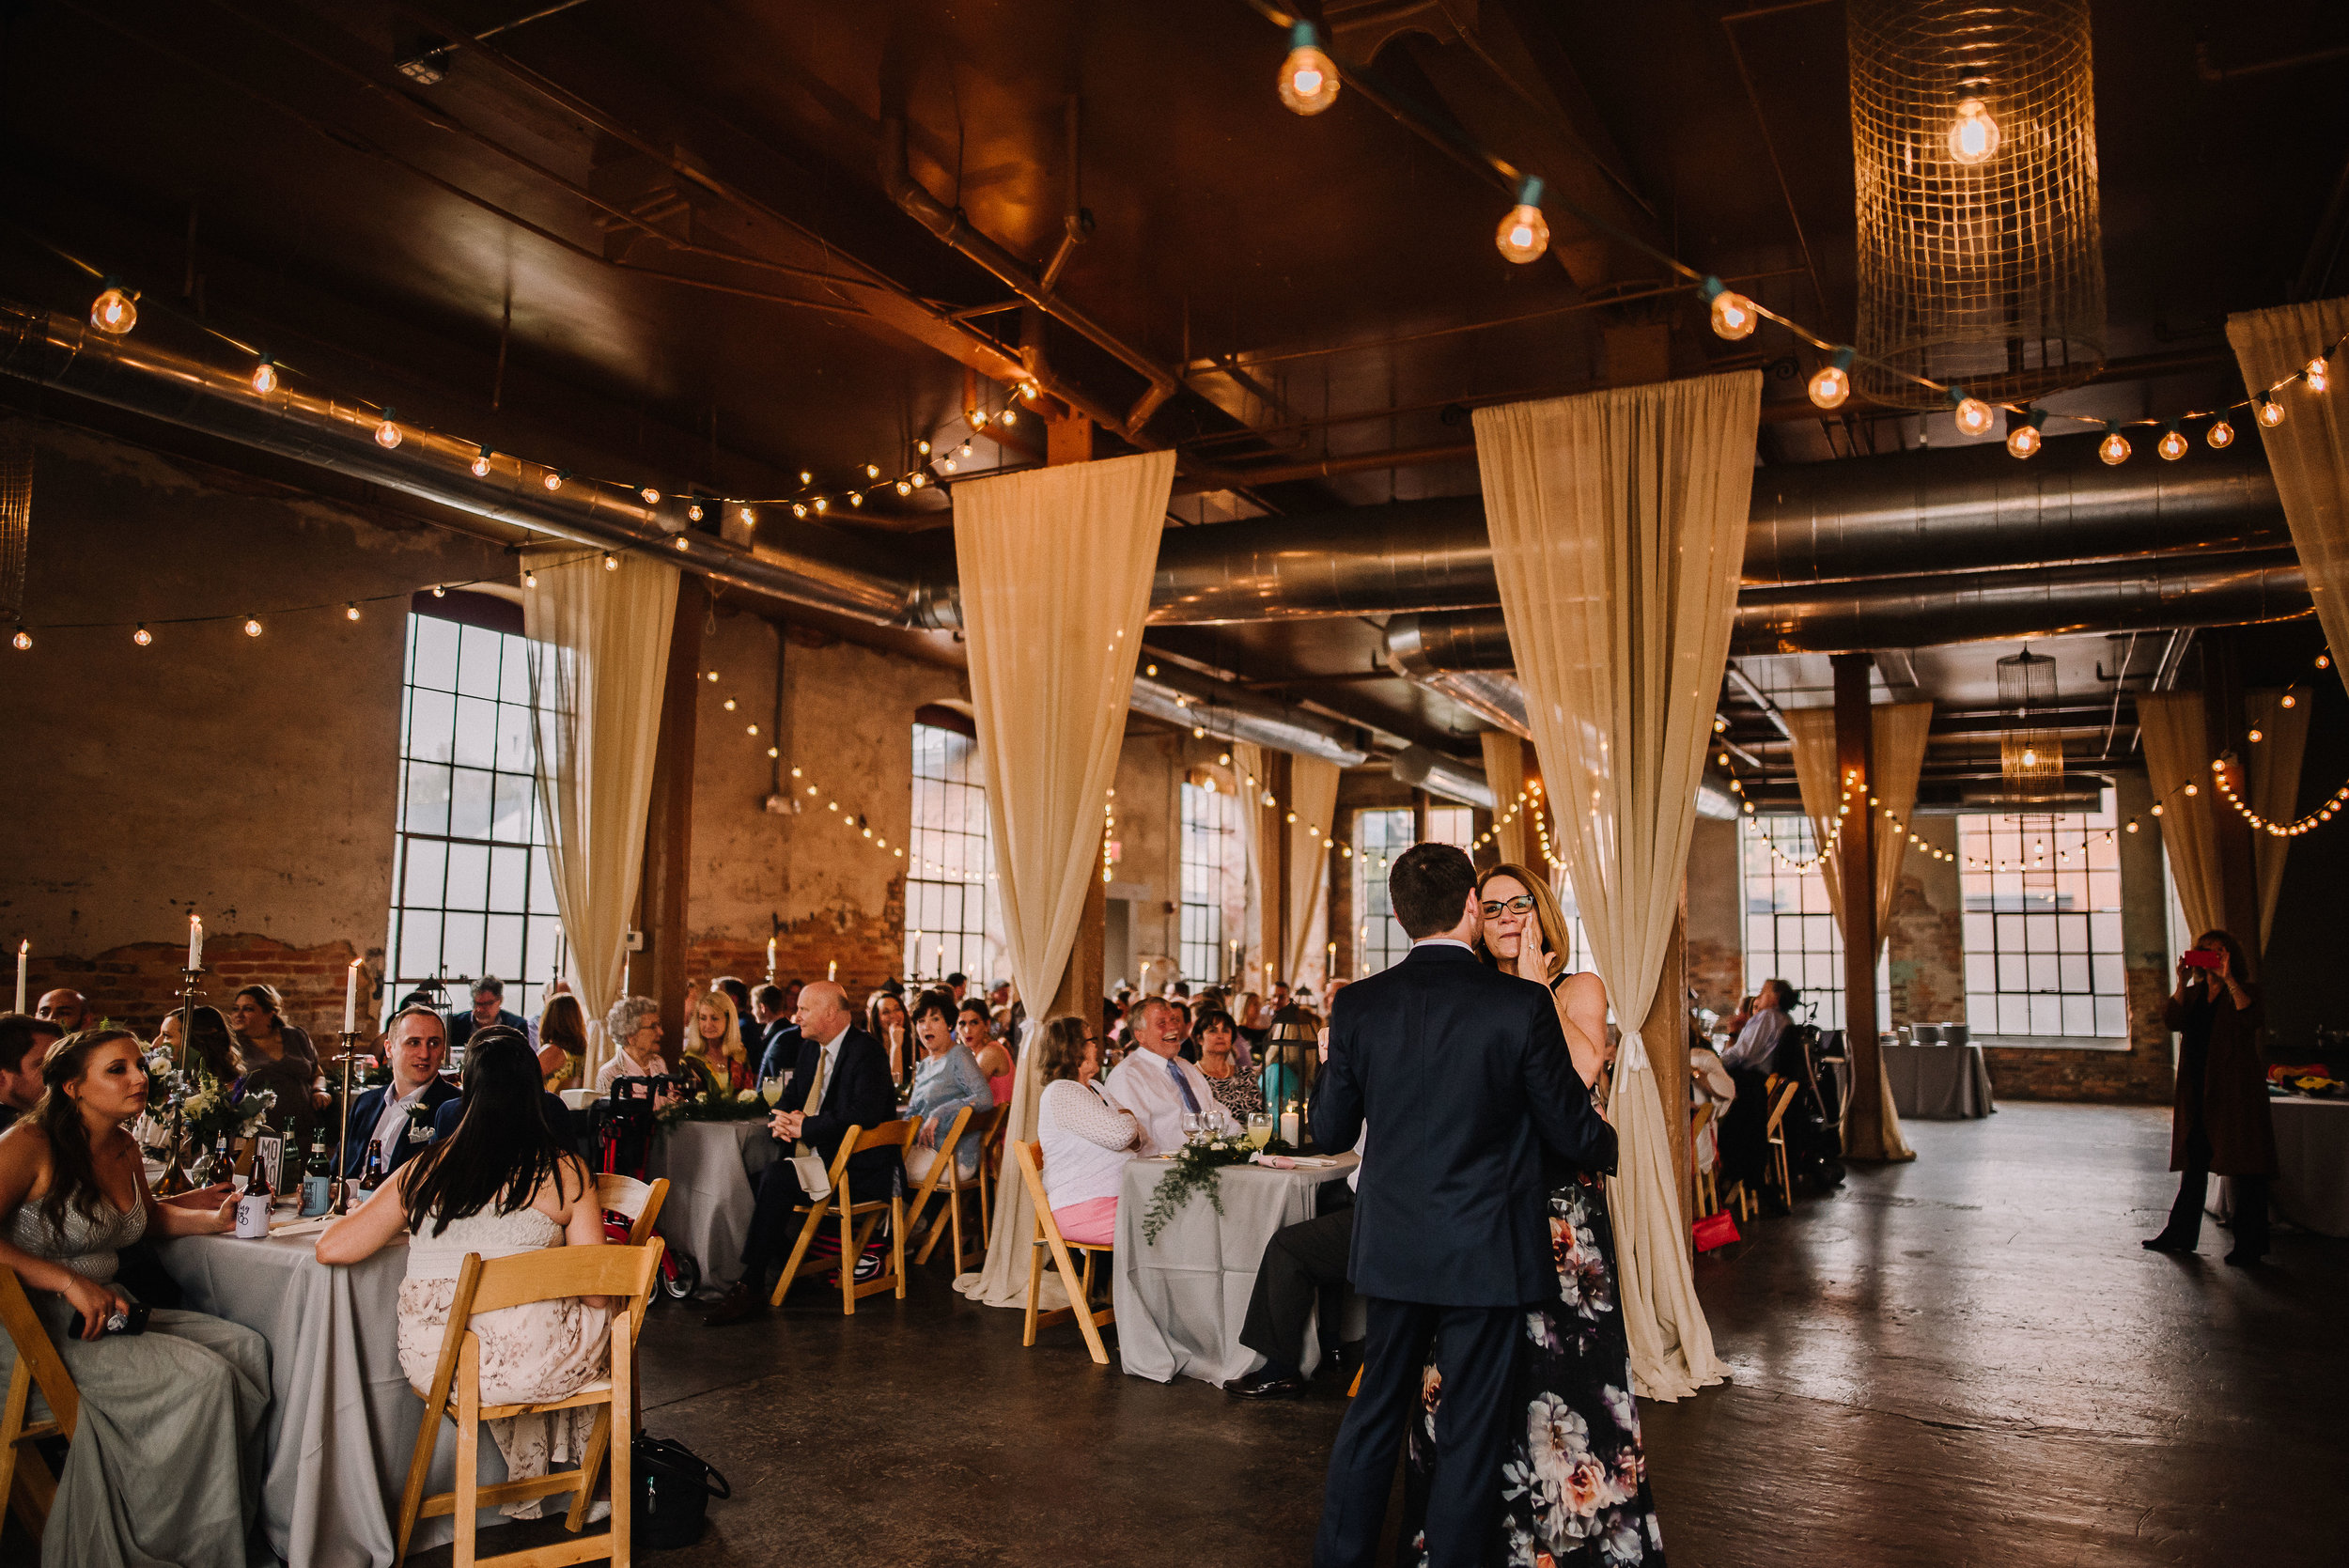 Morgan Wedding_Mill at Yellow River_Ashley Benham Photography-1026.jpg